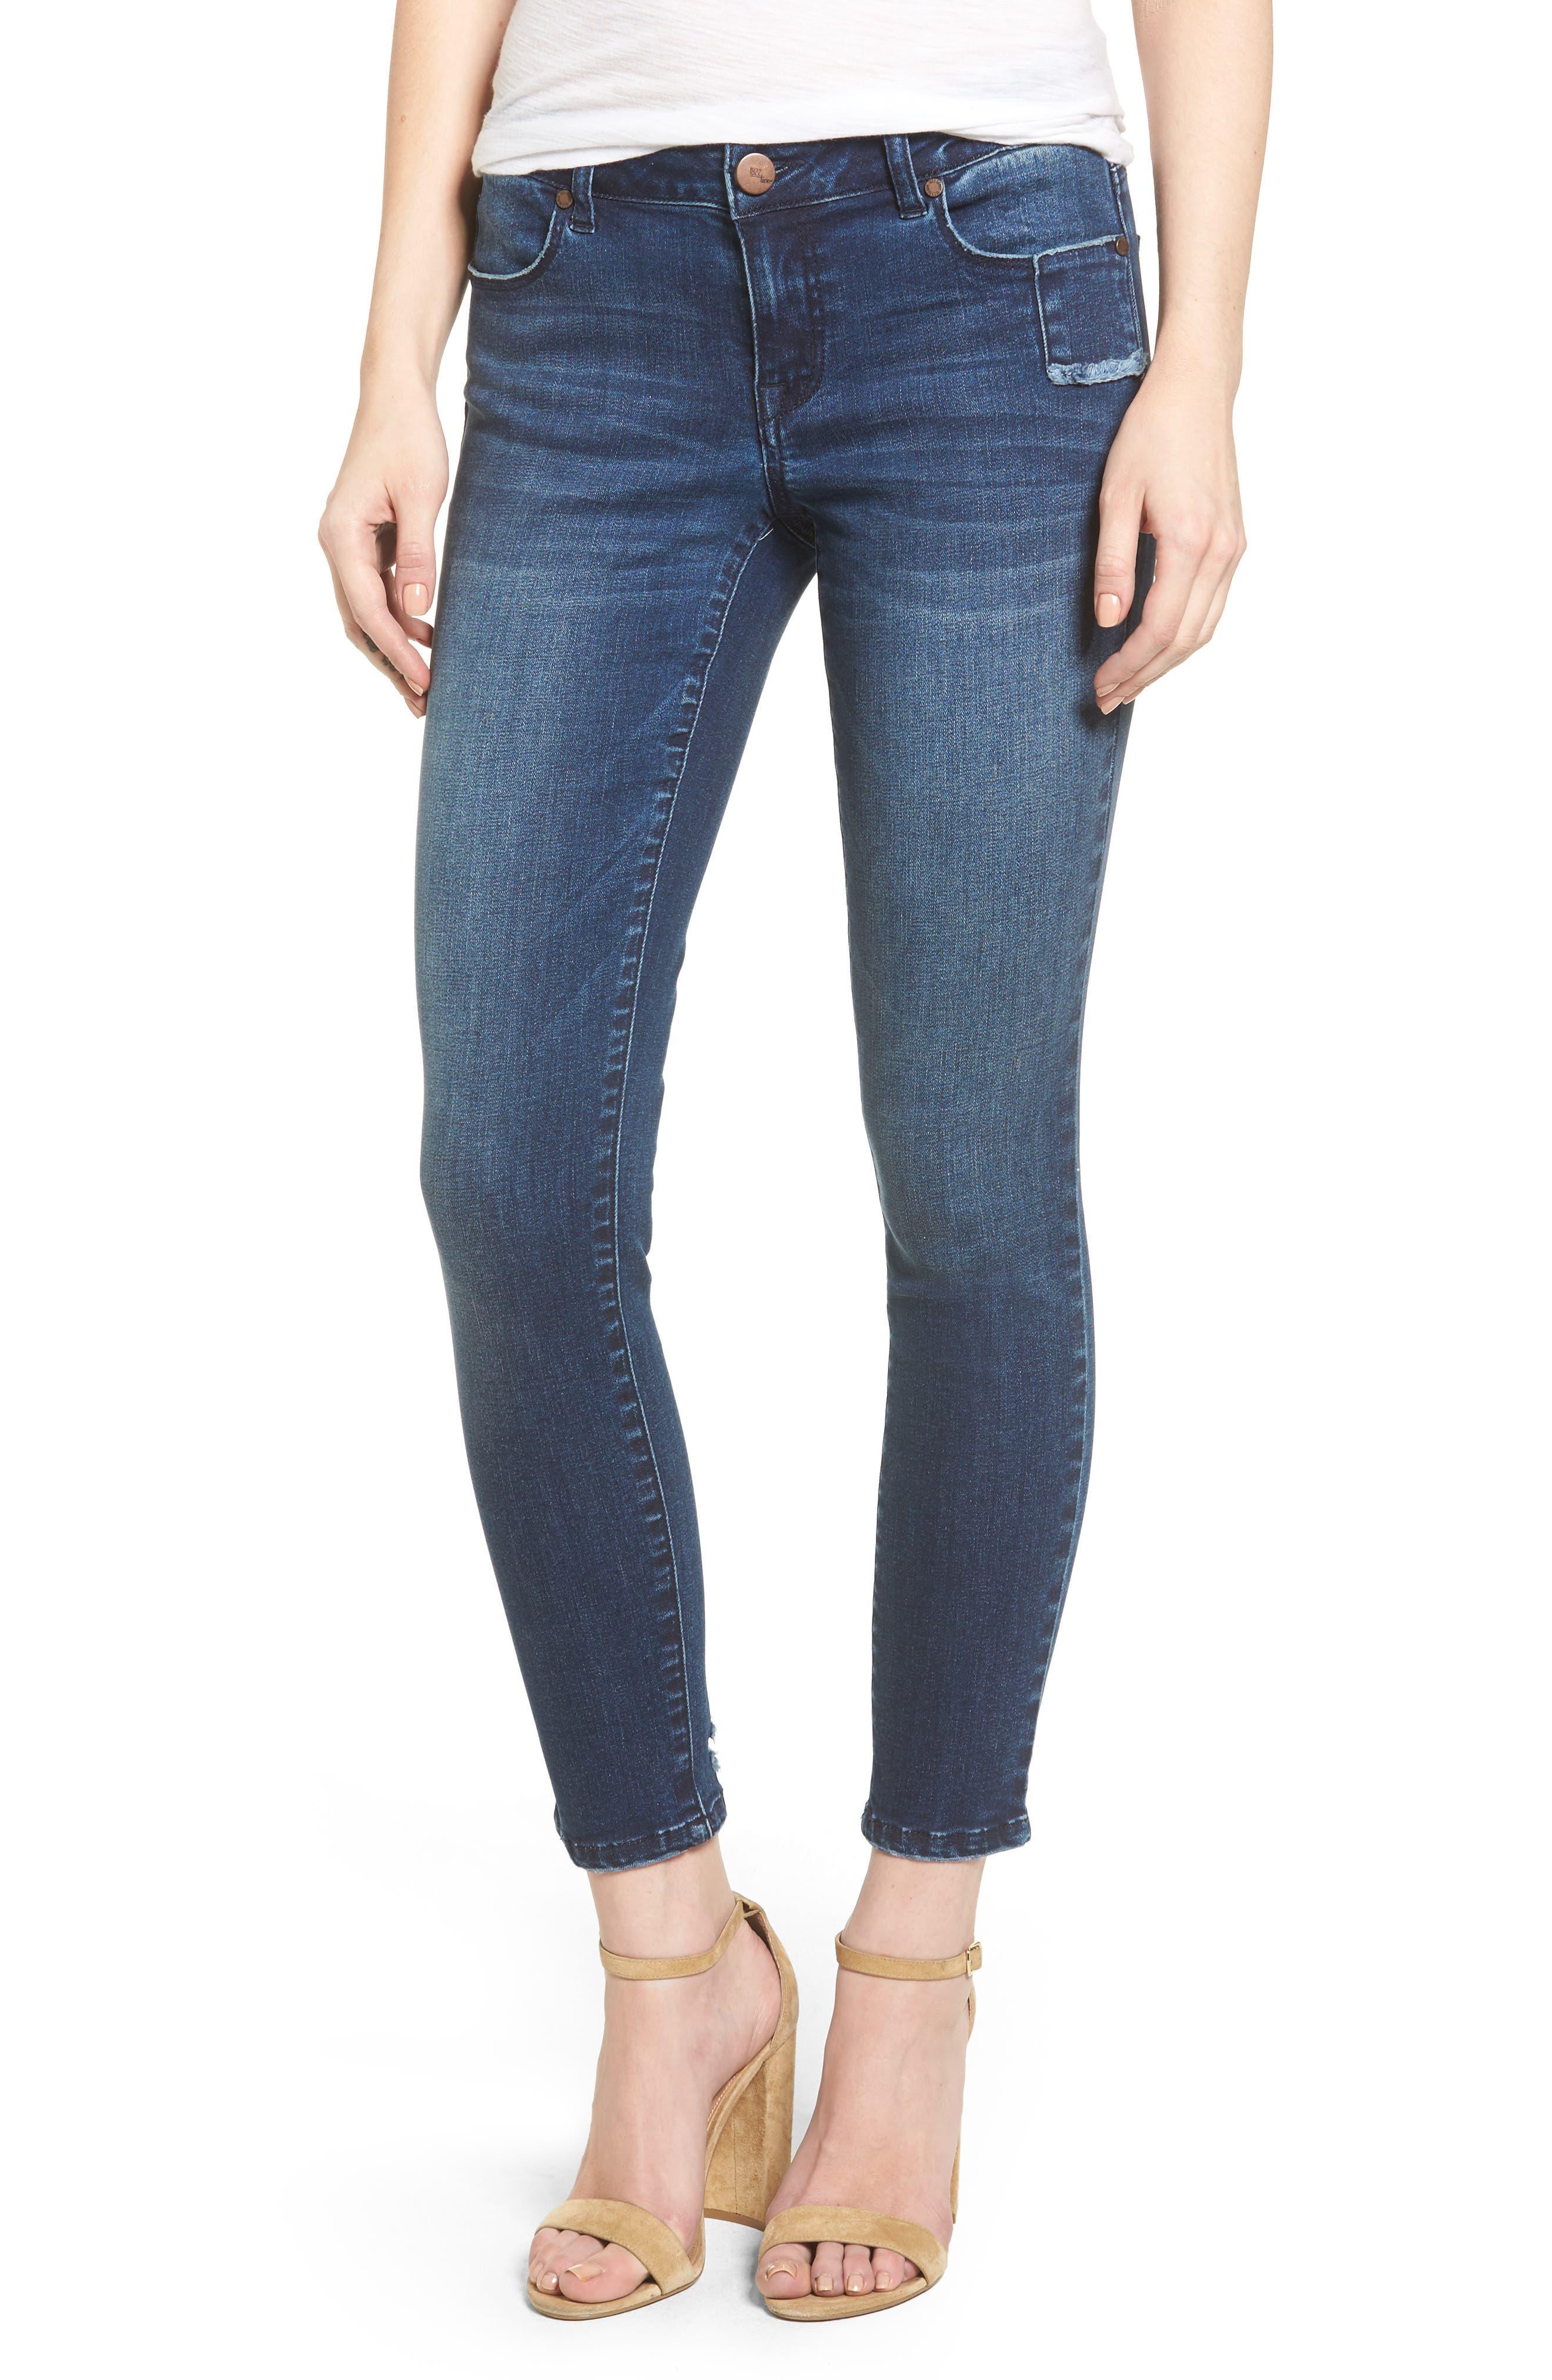 1822 Denim Ripped Skinny Jeans (Stevie)